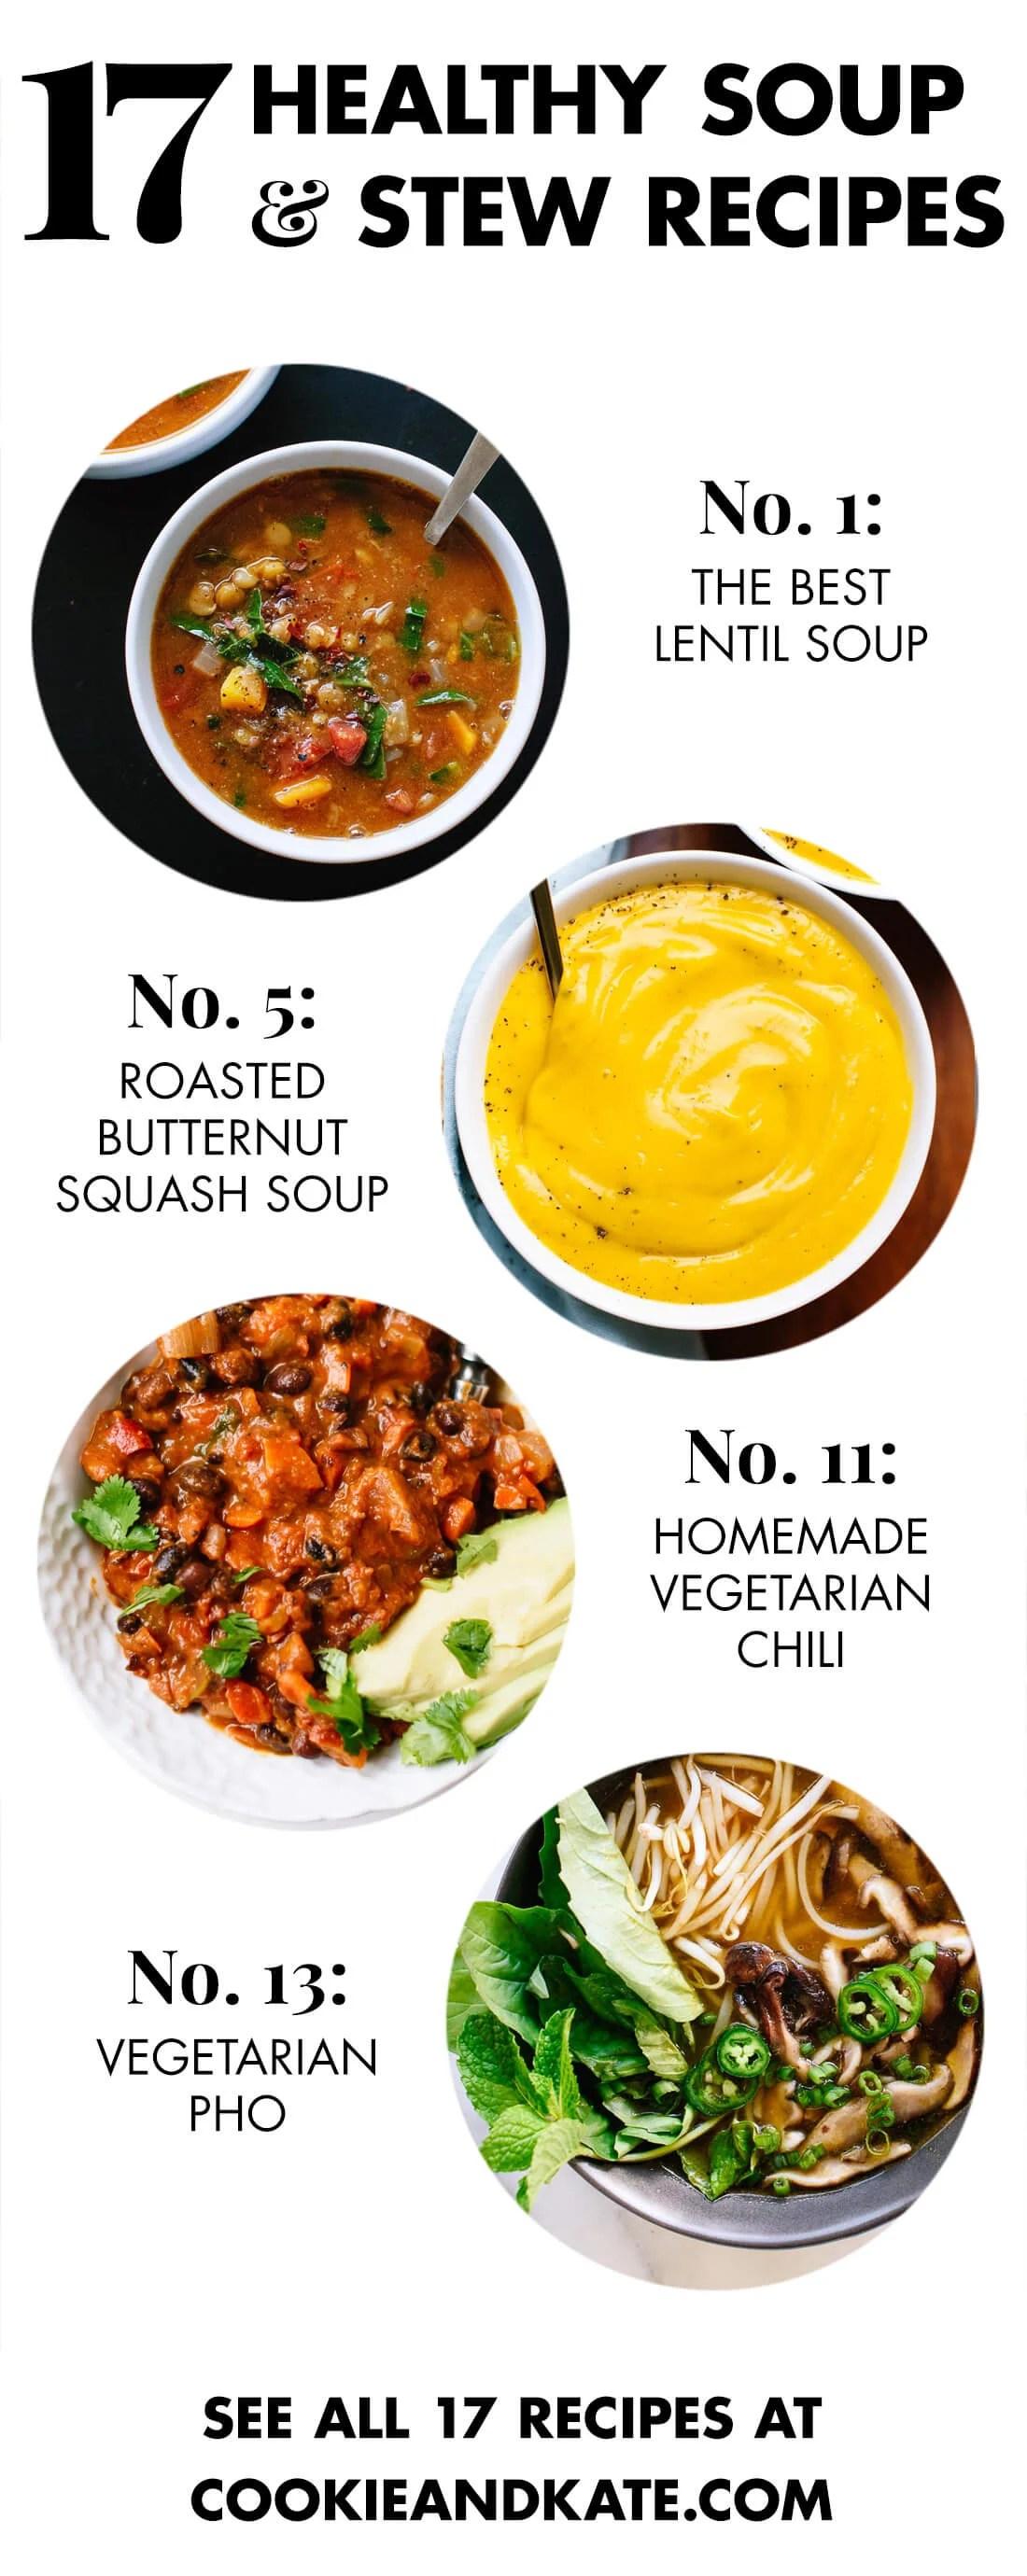 17 Healthy Vegetarian Soup Recipes